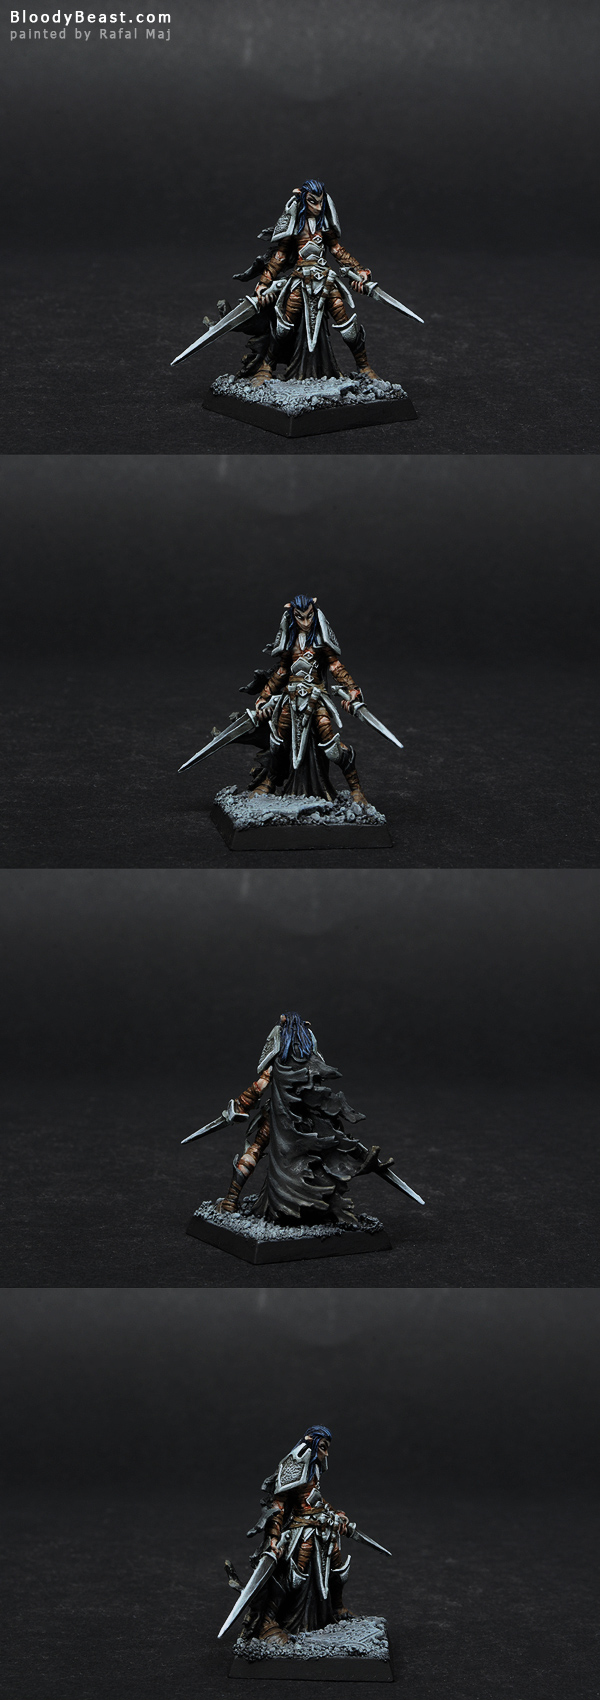 Darkreach Nightshade Warrior painted by Rafal Maj (BloodyBeast.com)